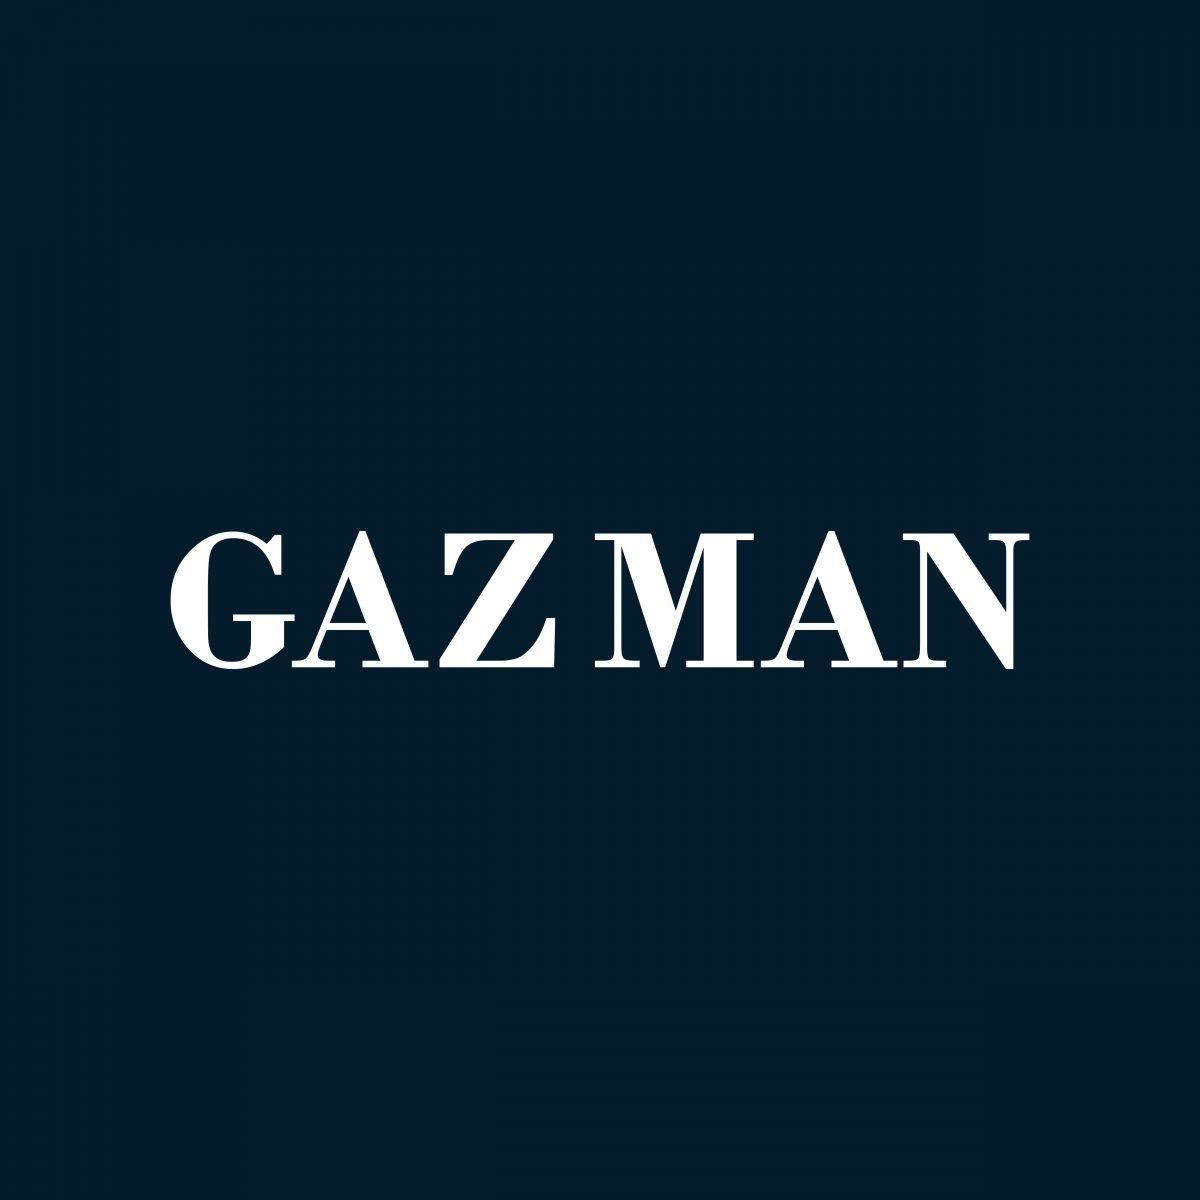 Gazman Logo 1200x1200